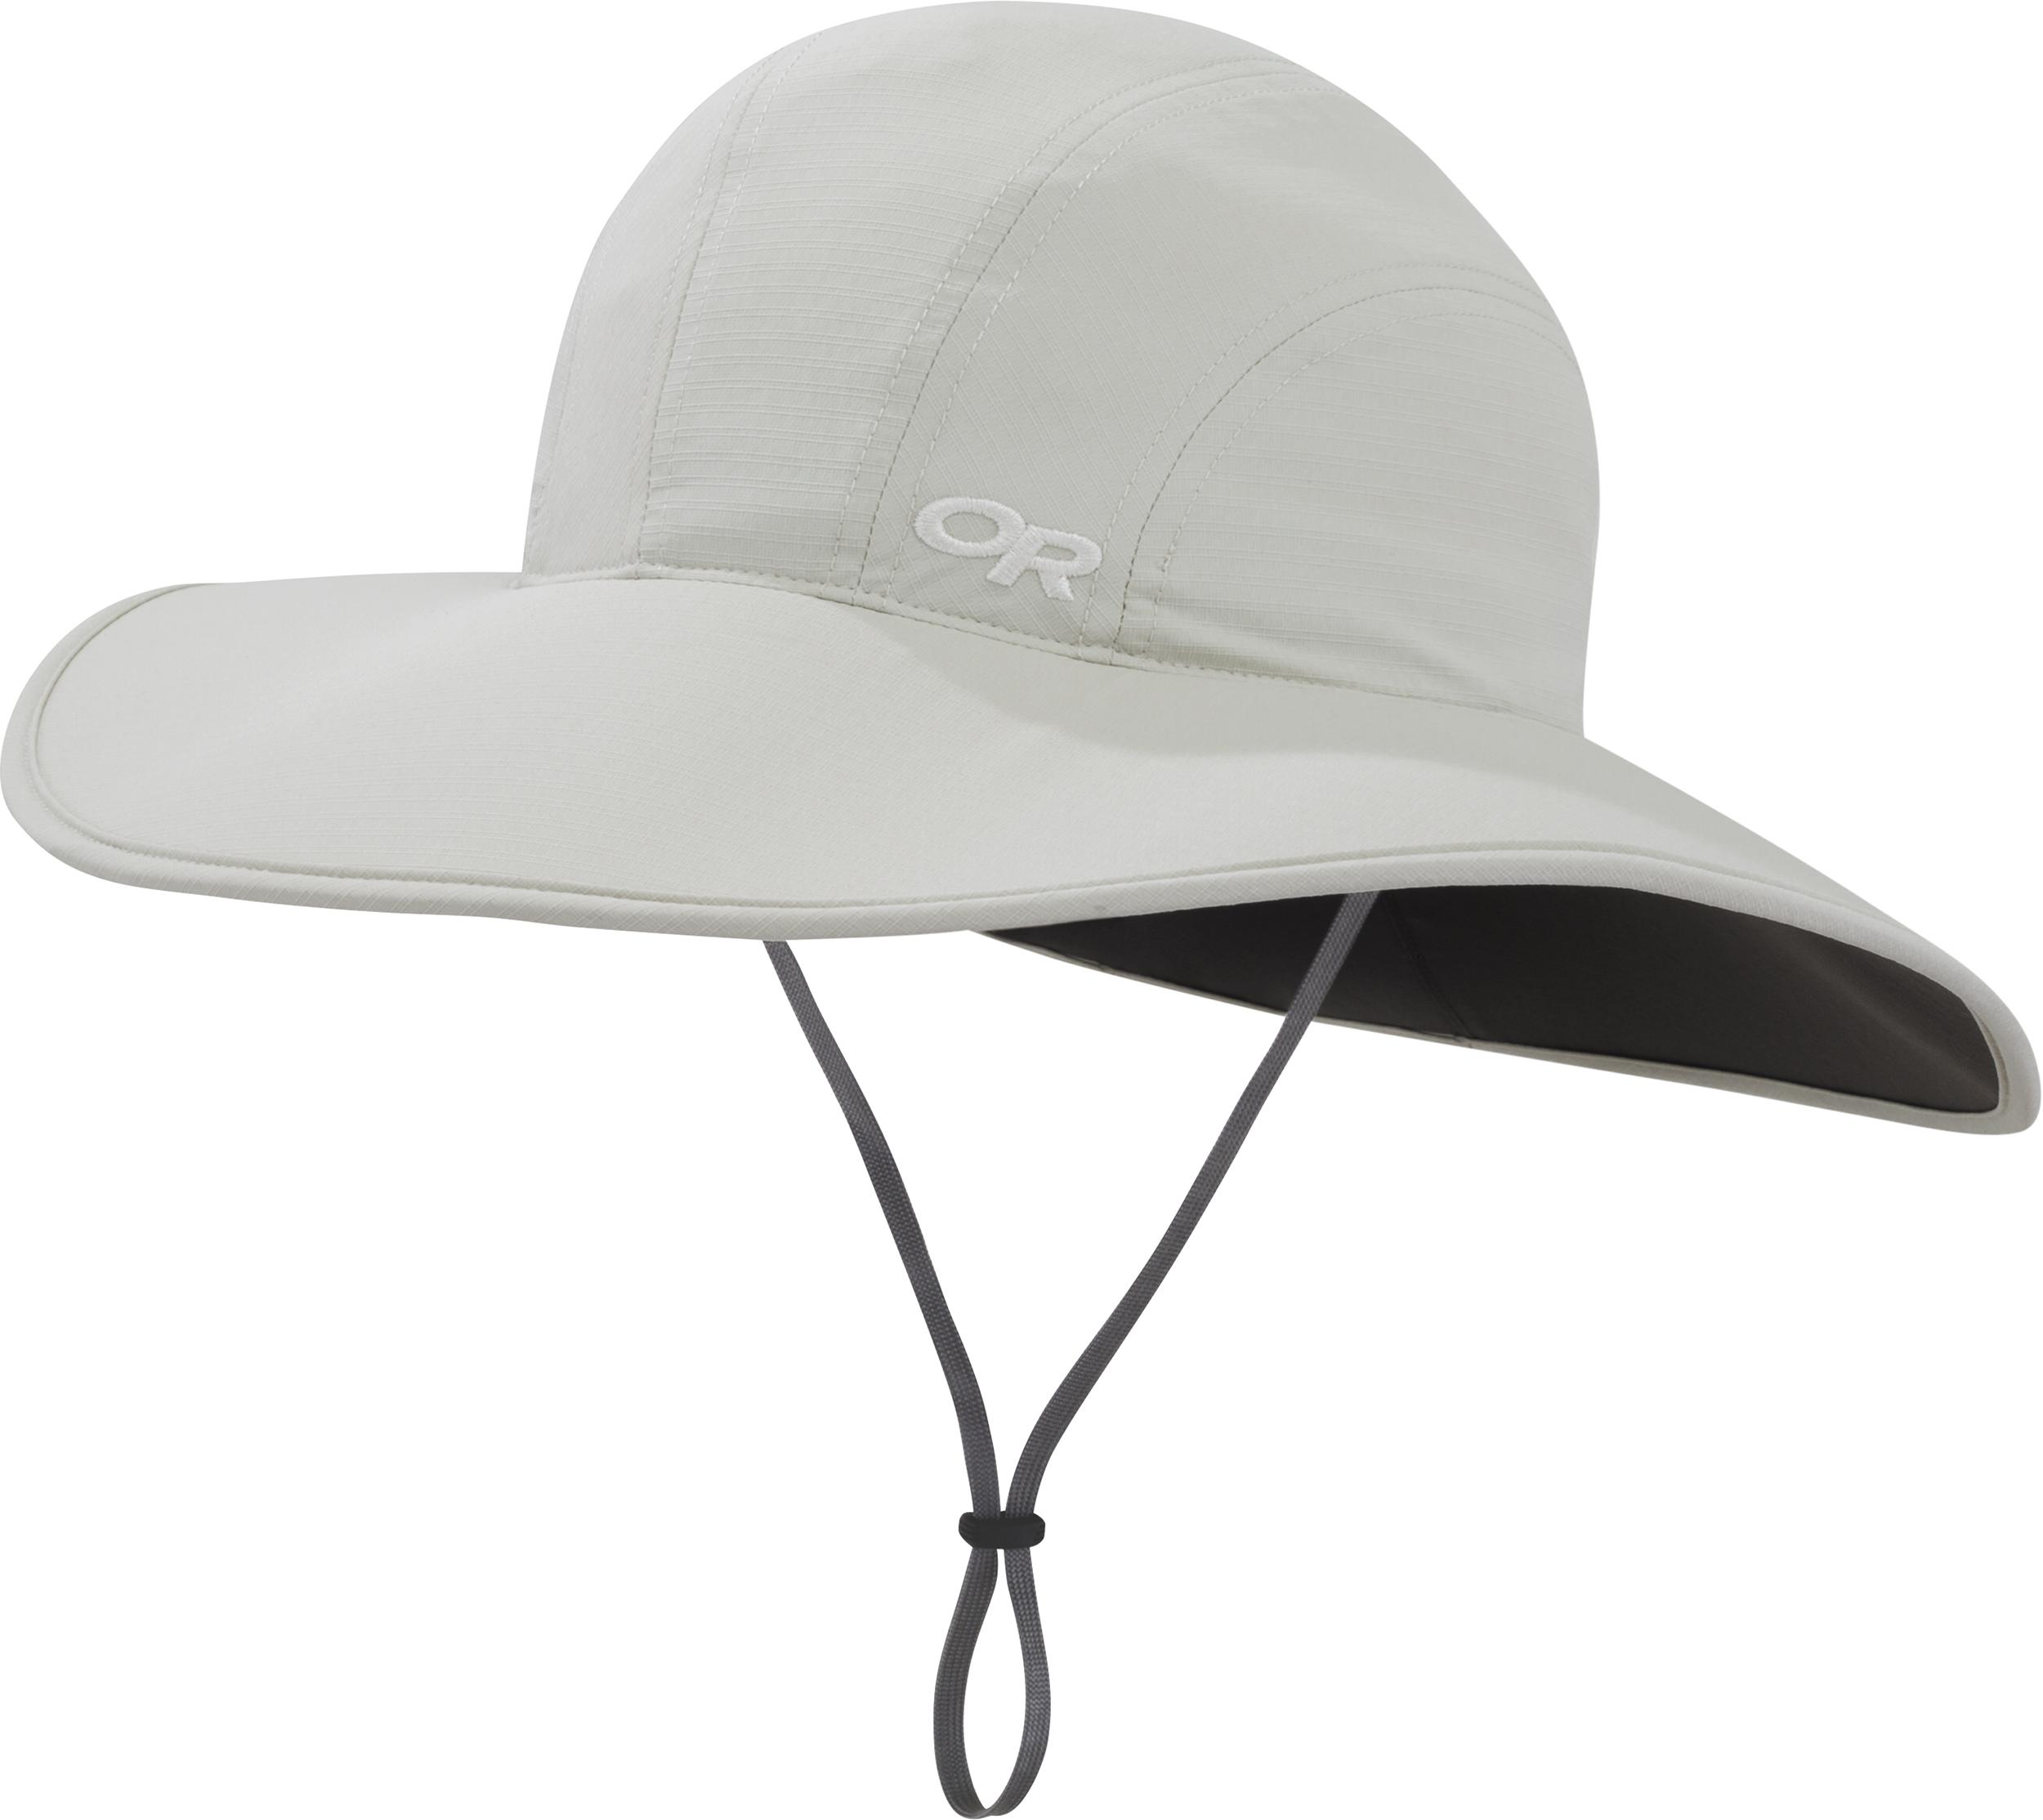 0c15afa5263a9 Women's Sun hats | MEC